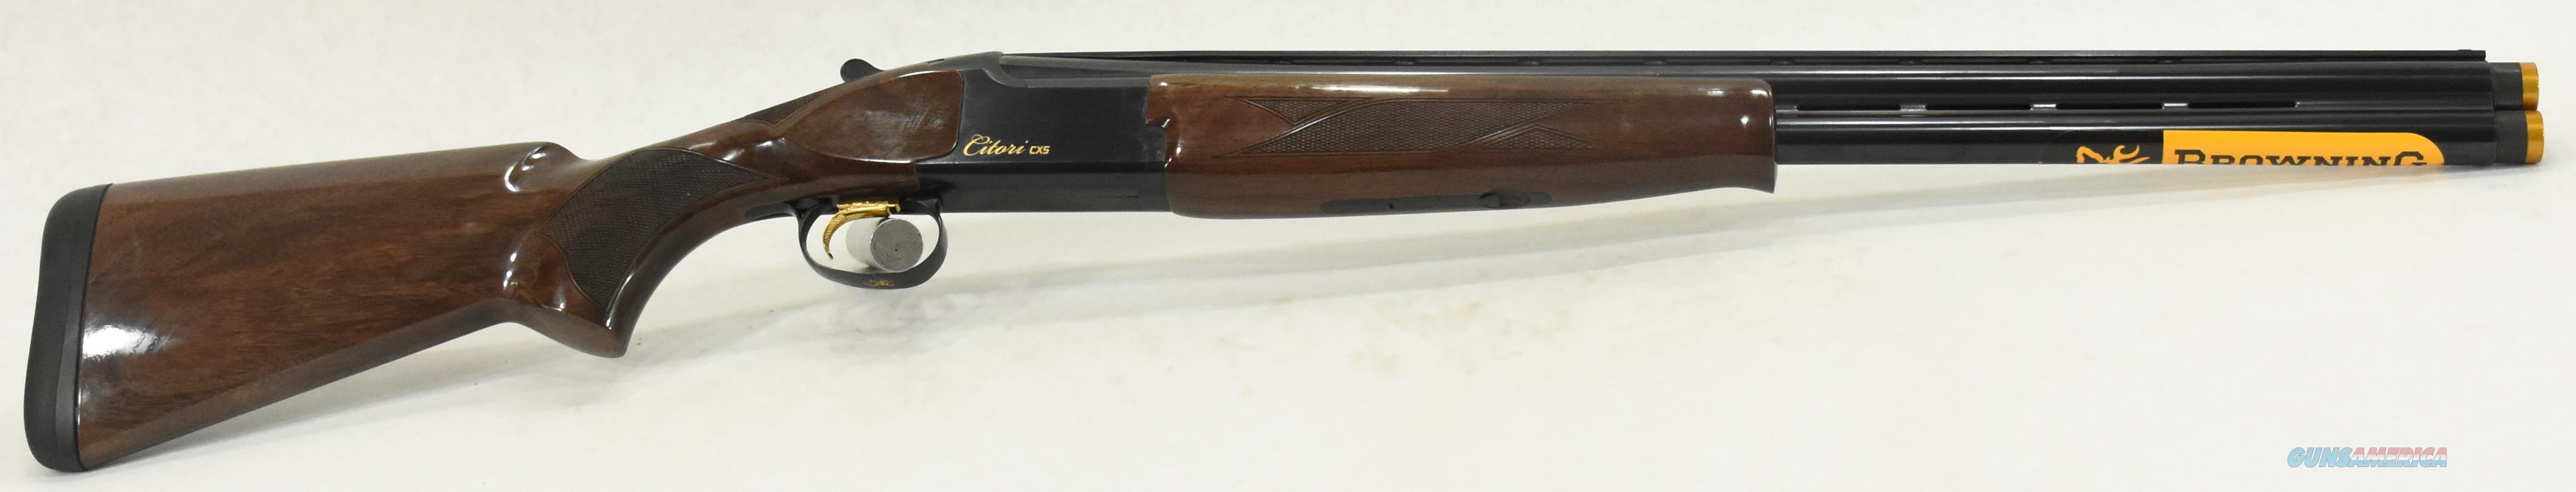 Citori CXS Micro 12Ga 24-3In  018140306  Guns > Shotguns > Browning Shotguns > Over Unders > Citori > Hunting